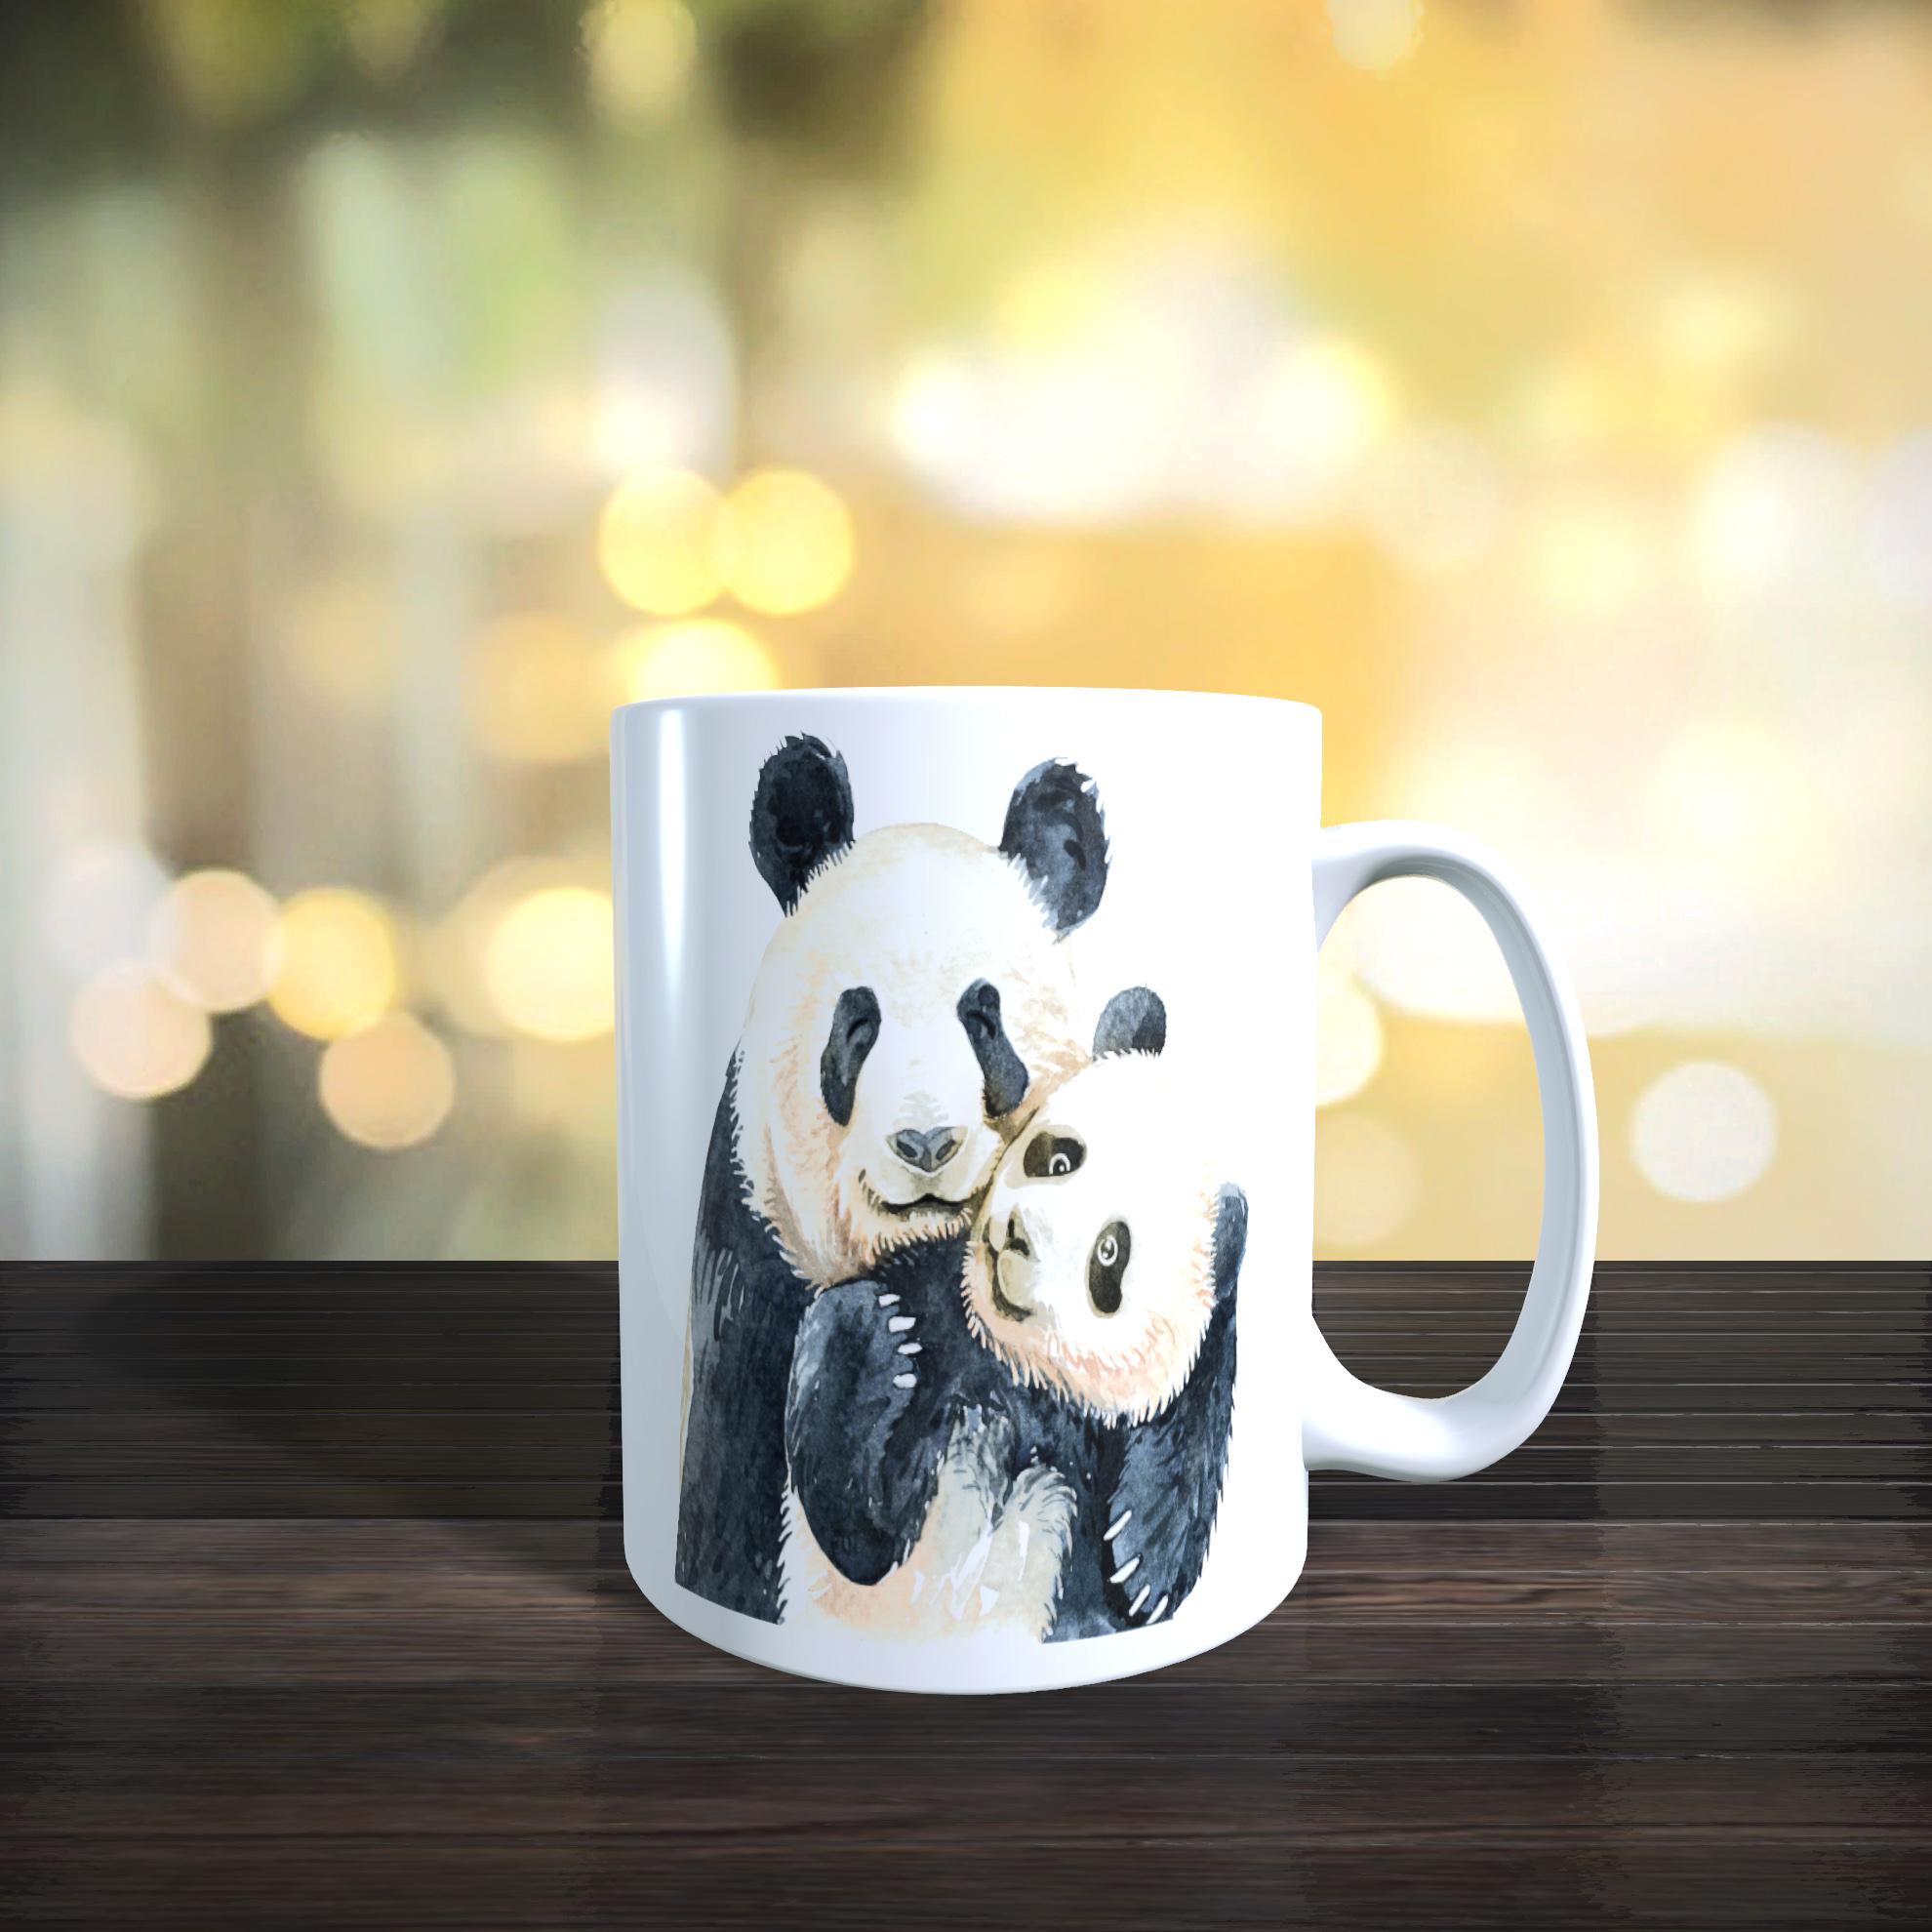 Cute Mother and Baby Panda Bear 11oz Ceramic Mothers Day / Birthday Gift Mug.